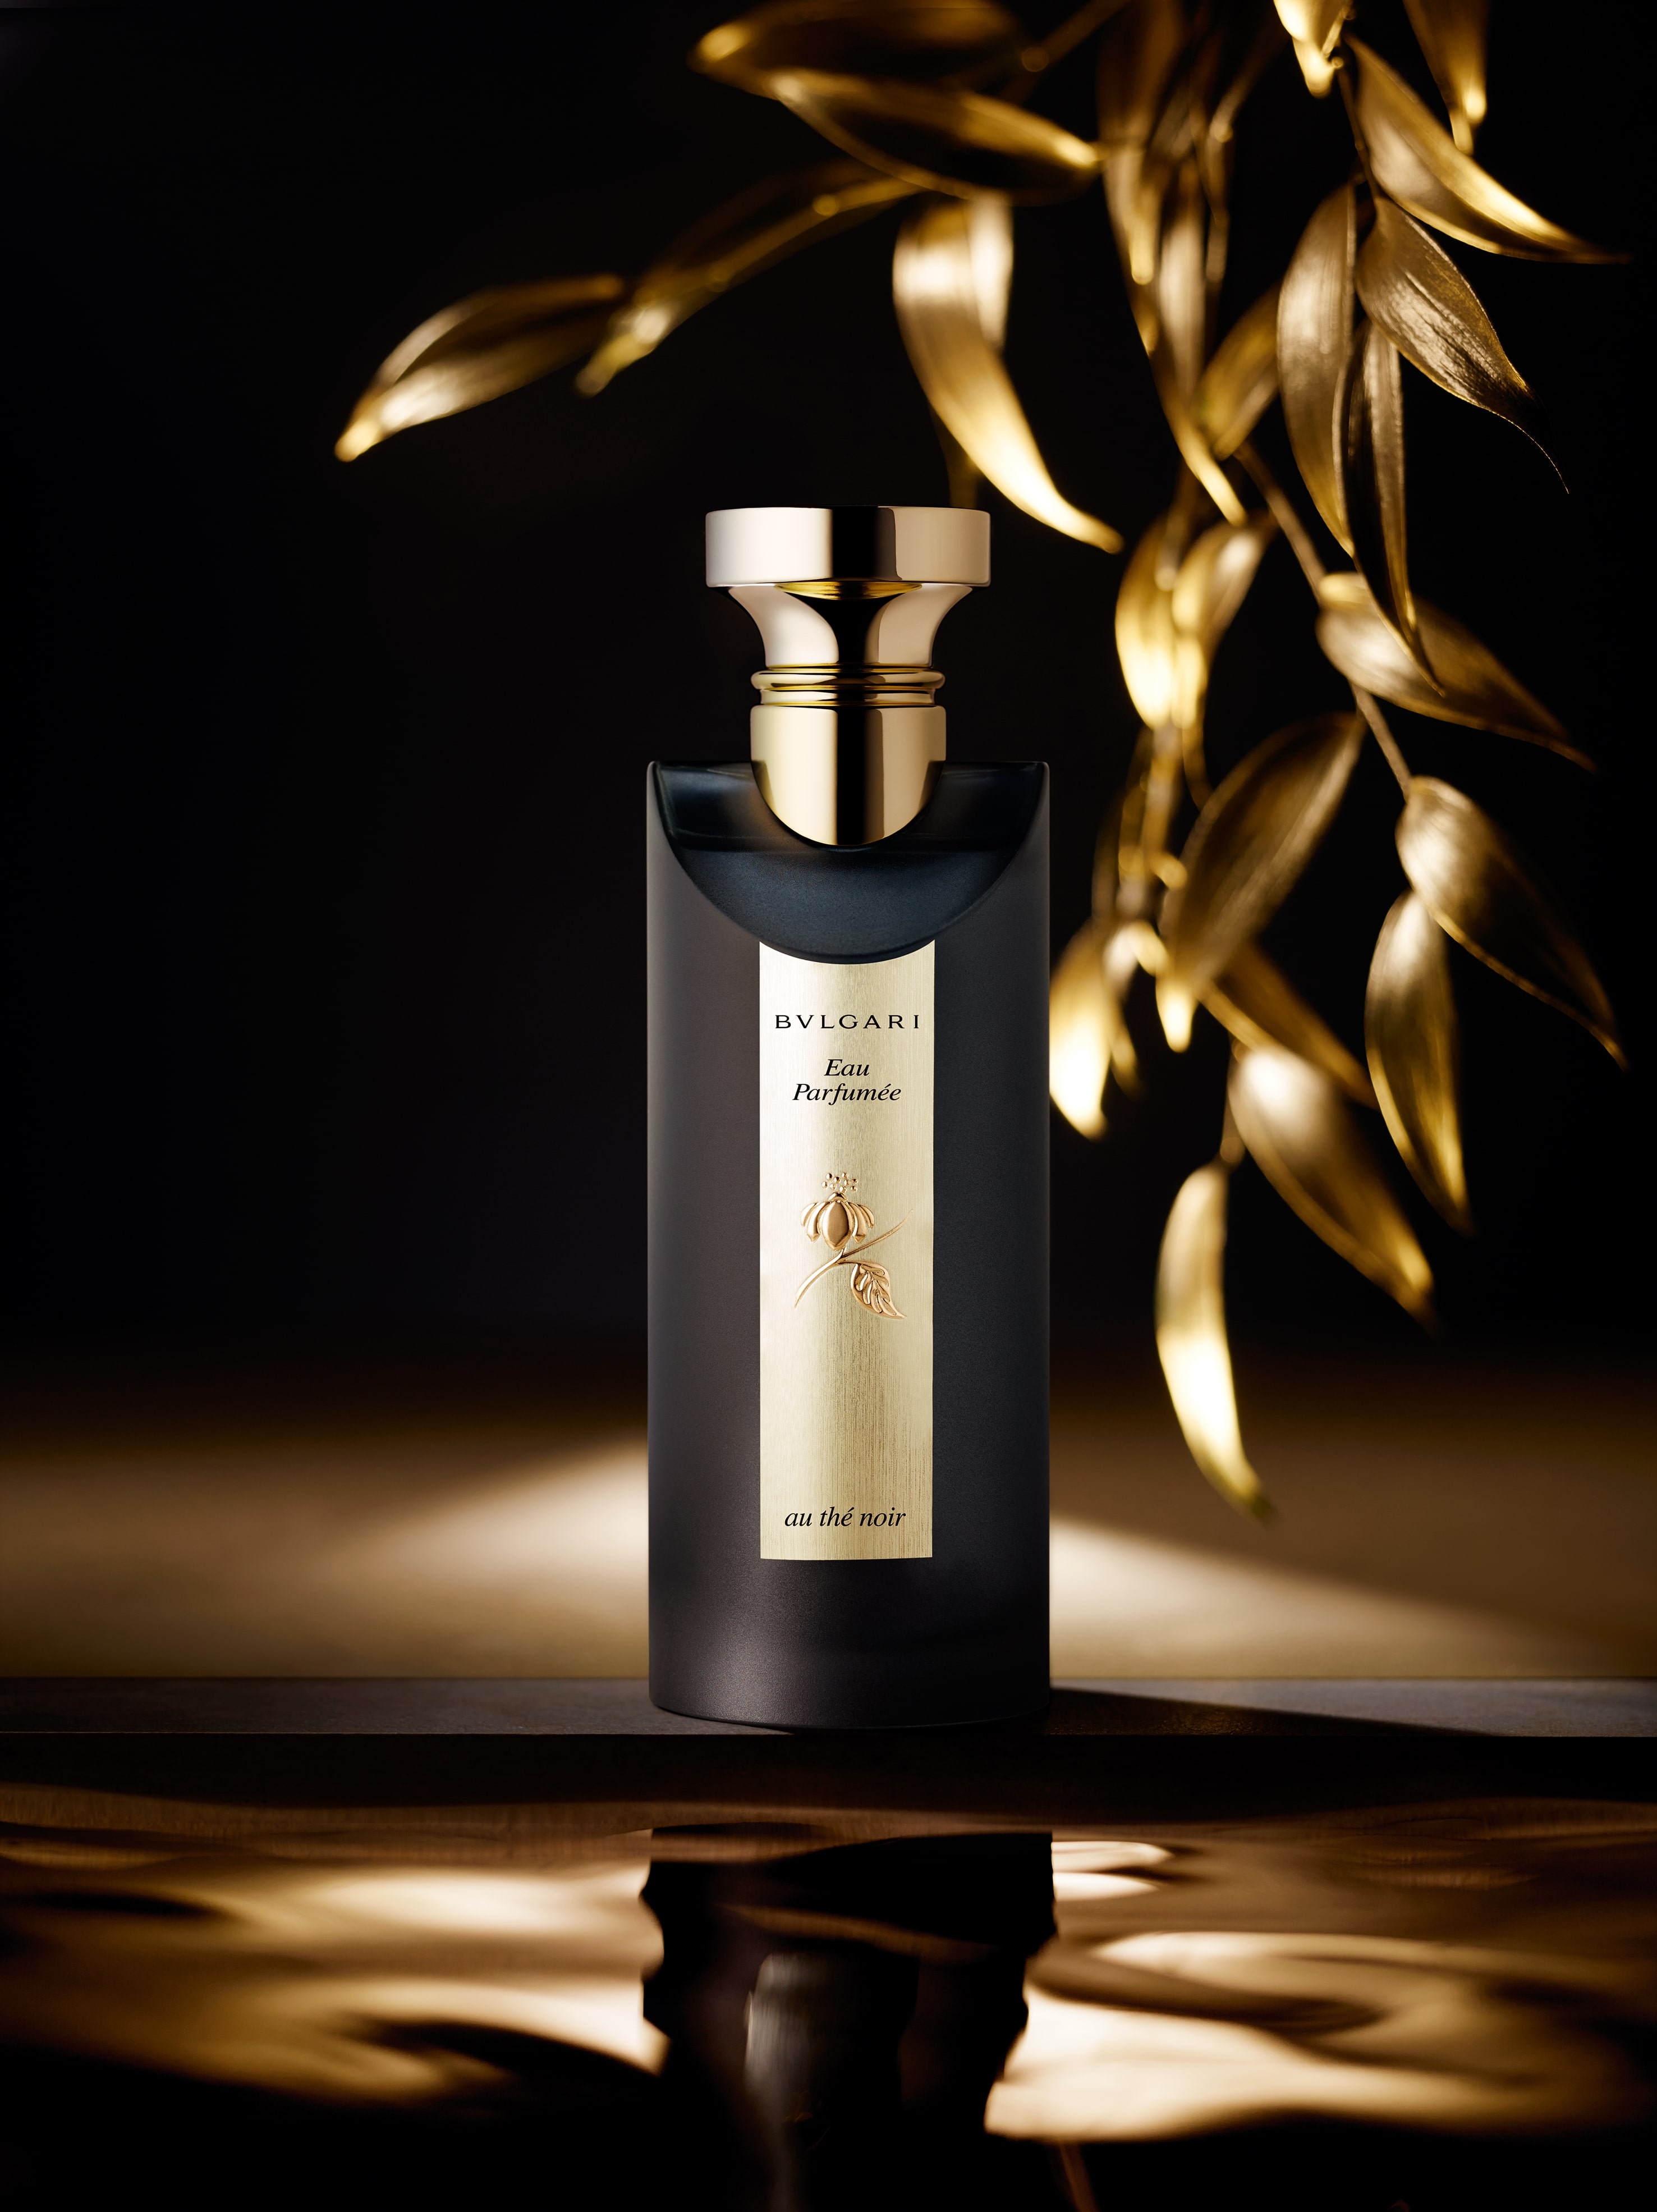 بررسی، مشاهده قیمت و خرید عطر (ادکلن) بولگاری او پارفومی او د نویر Bvlgari Eau Parfumee au The Noir اصل